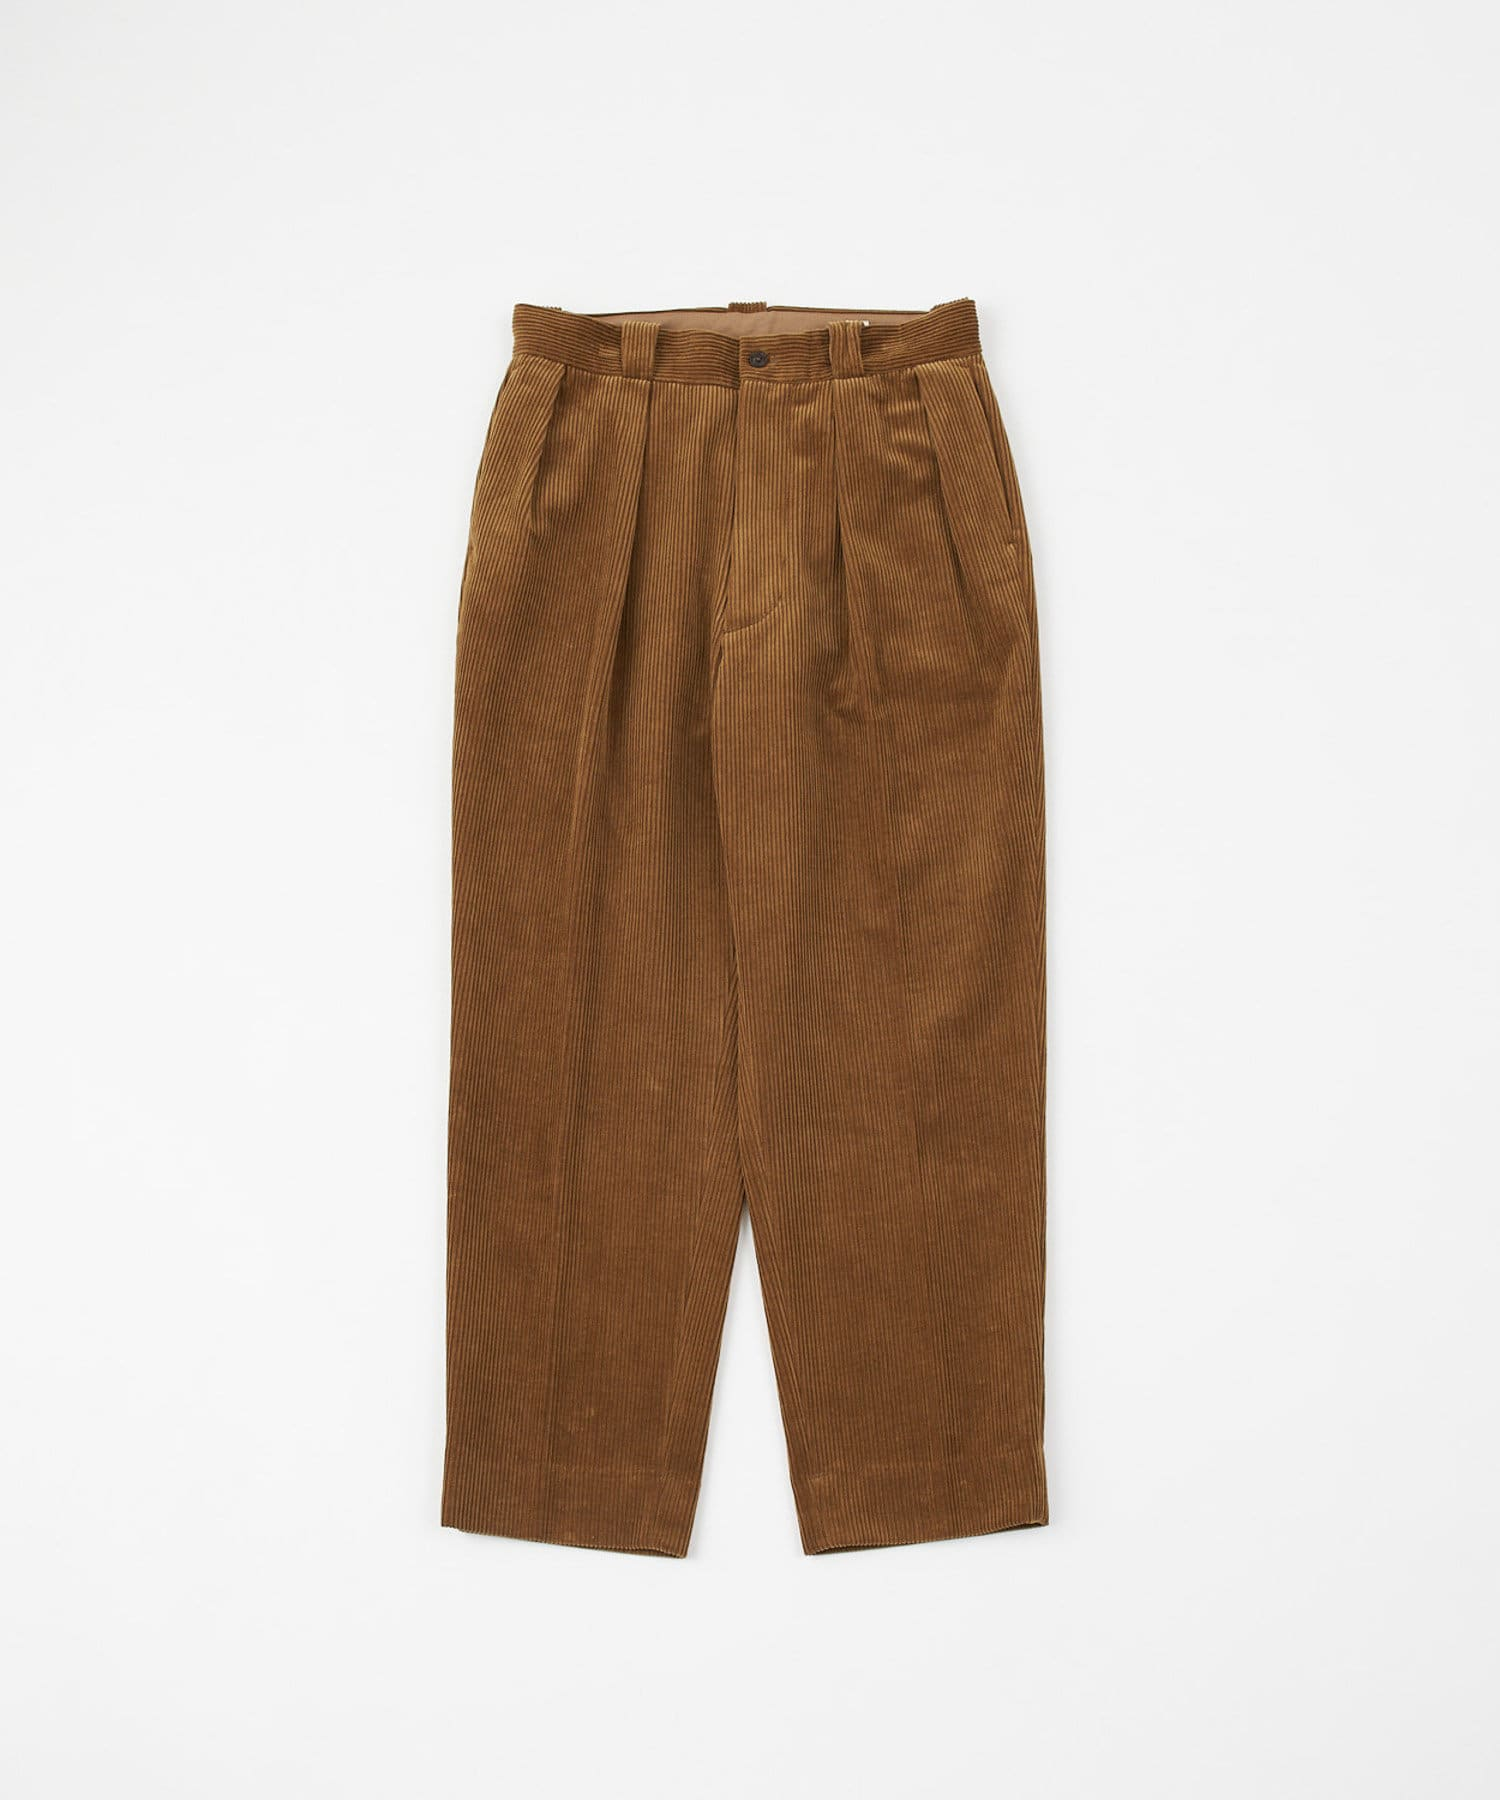 BLOOM&BRANCH(ブルームアンドブランチ) KAPTAIN SUNSHINE  2Pleats Trousers